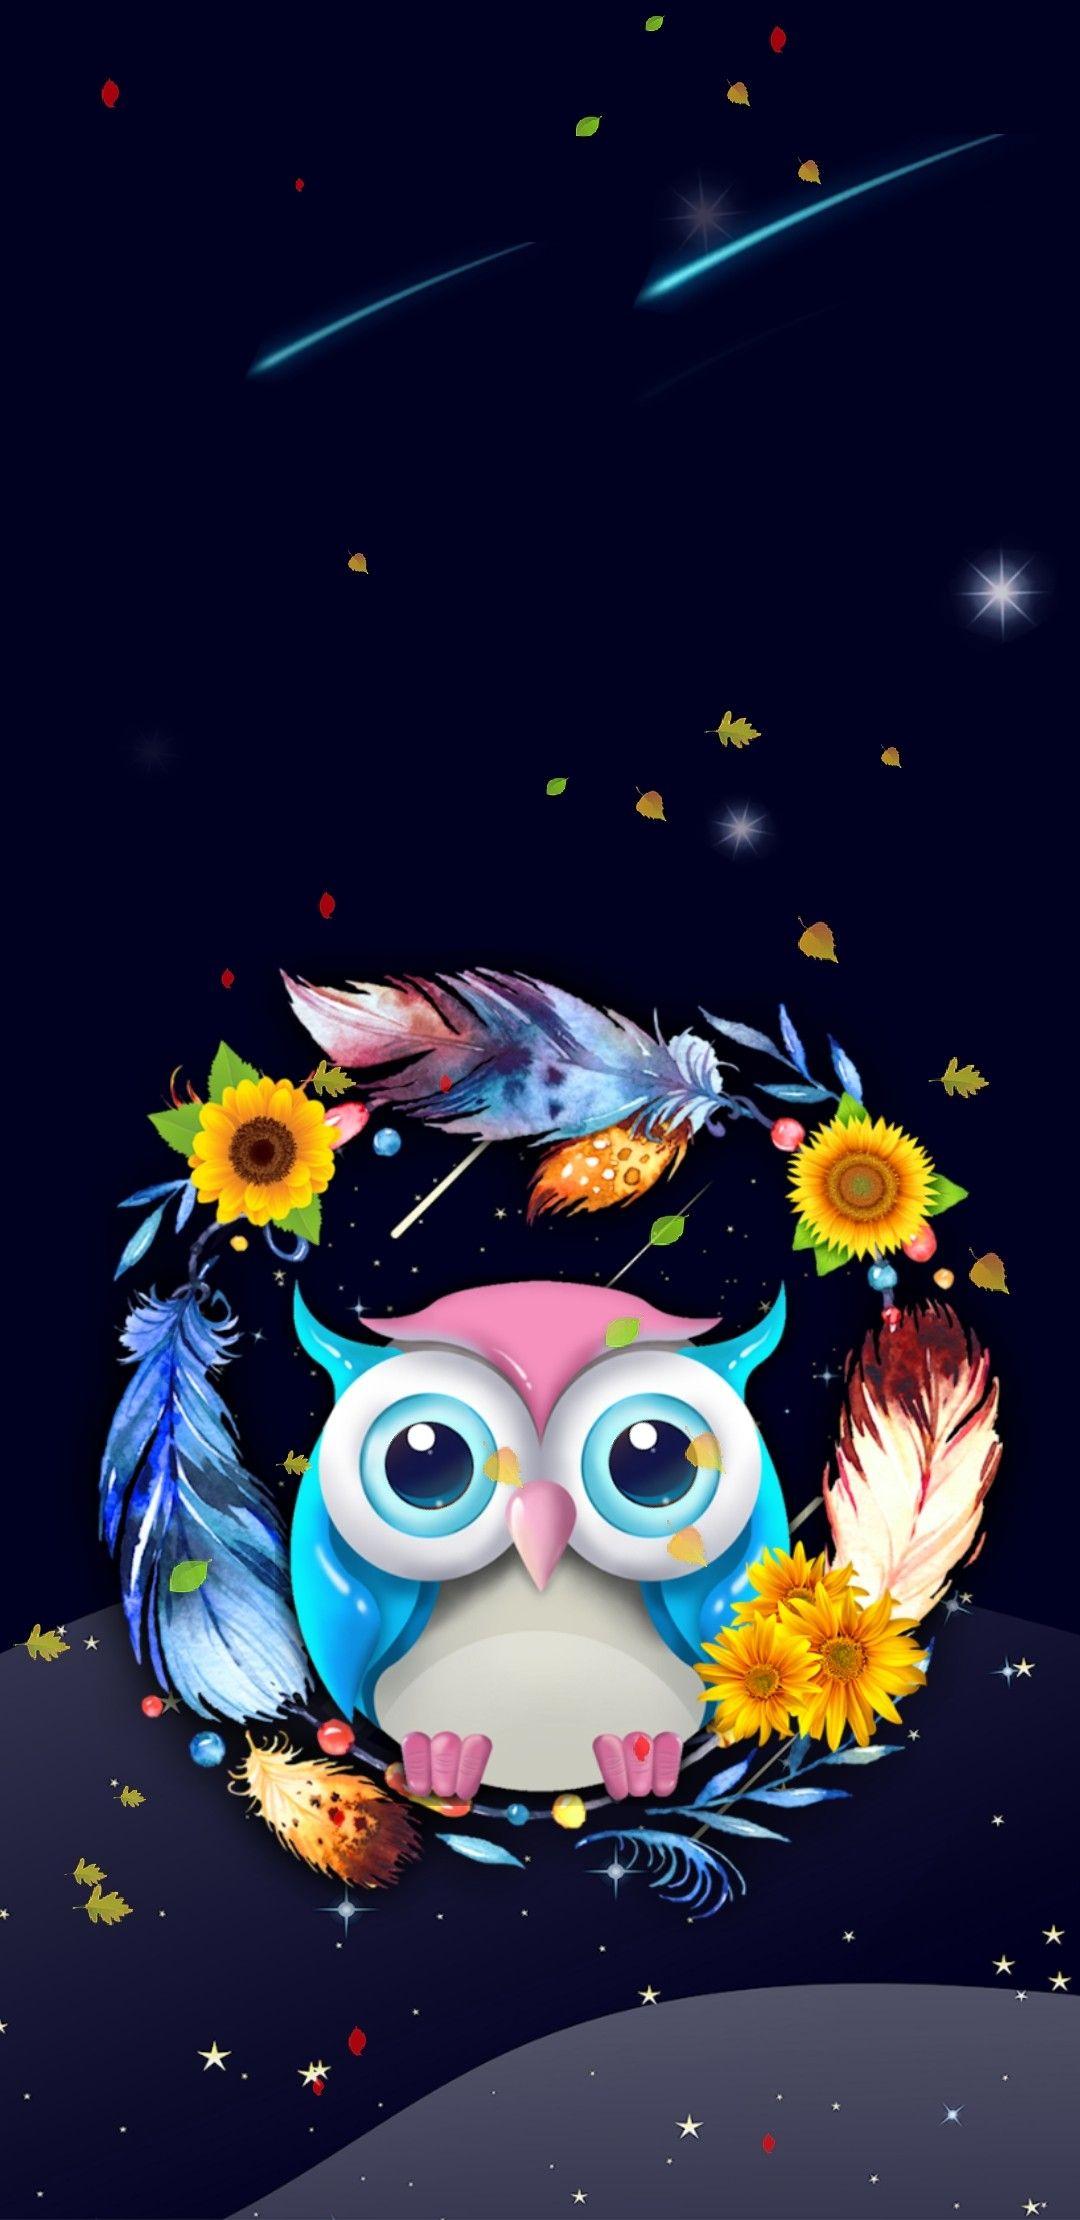 Wallpaper By Artist Unknown Cute Owls Wallpaper Owl Wallpaper Iphone Owl Wallpaper